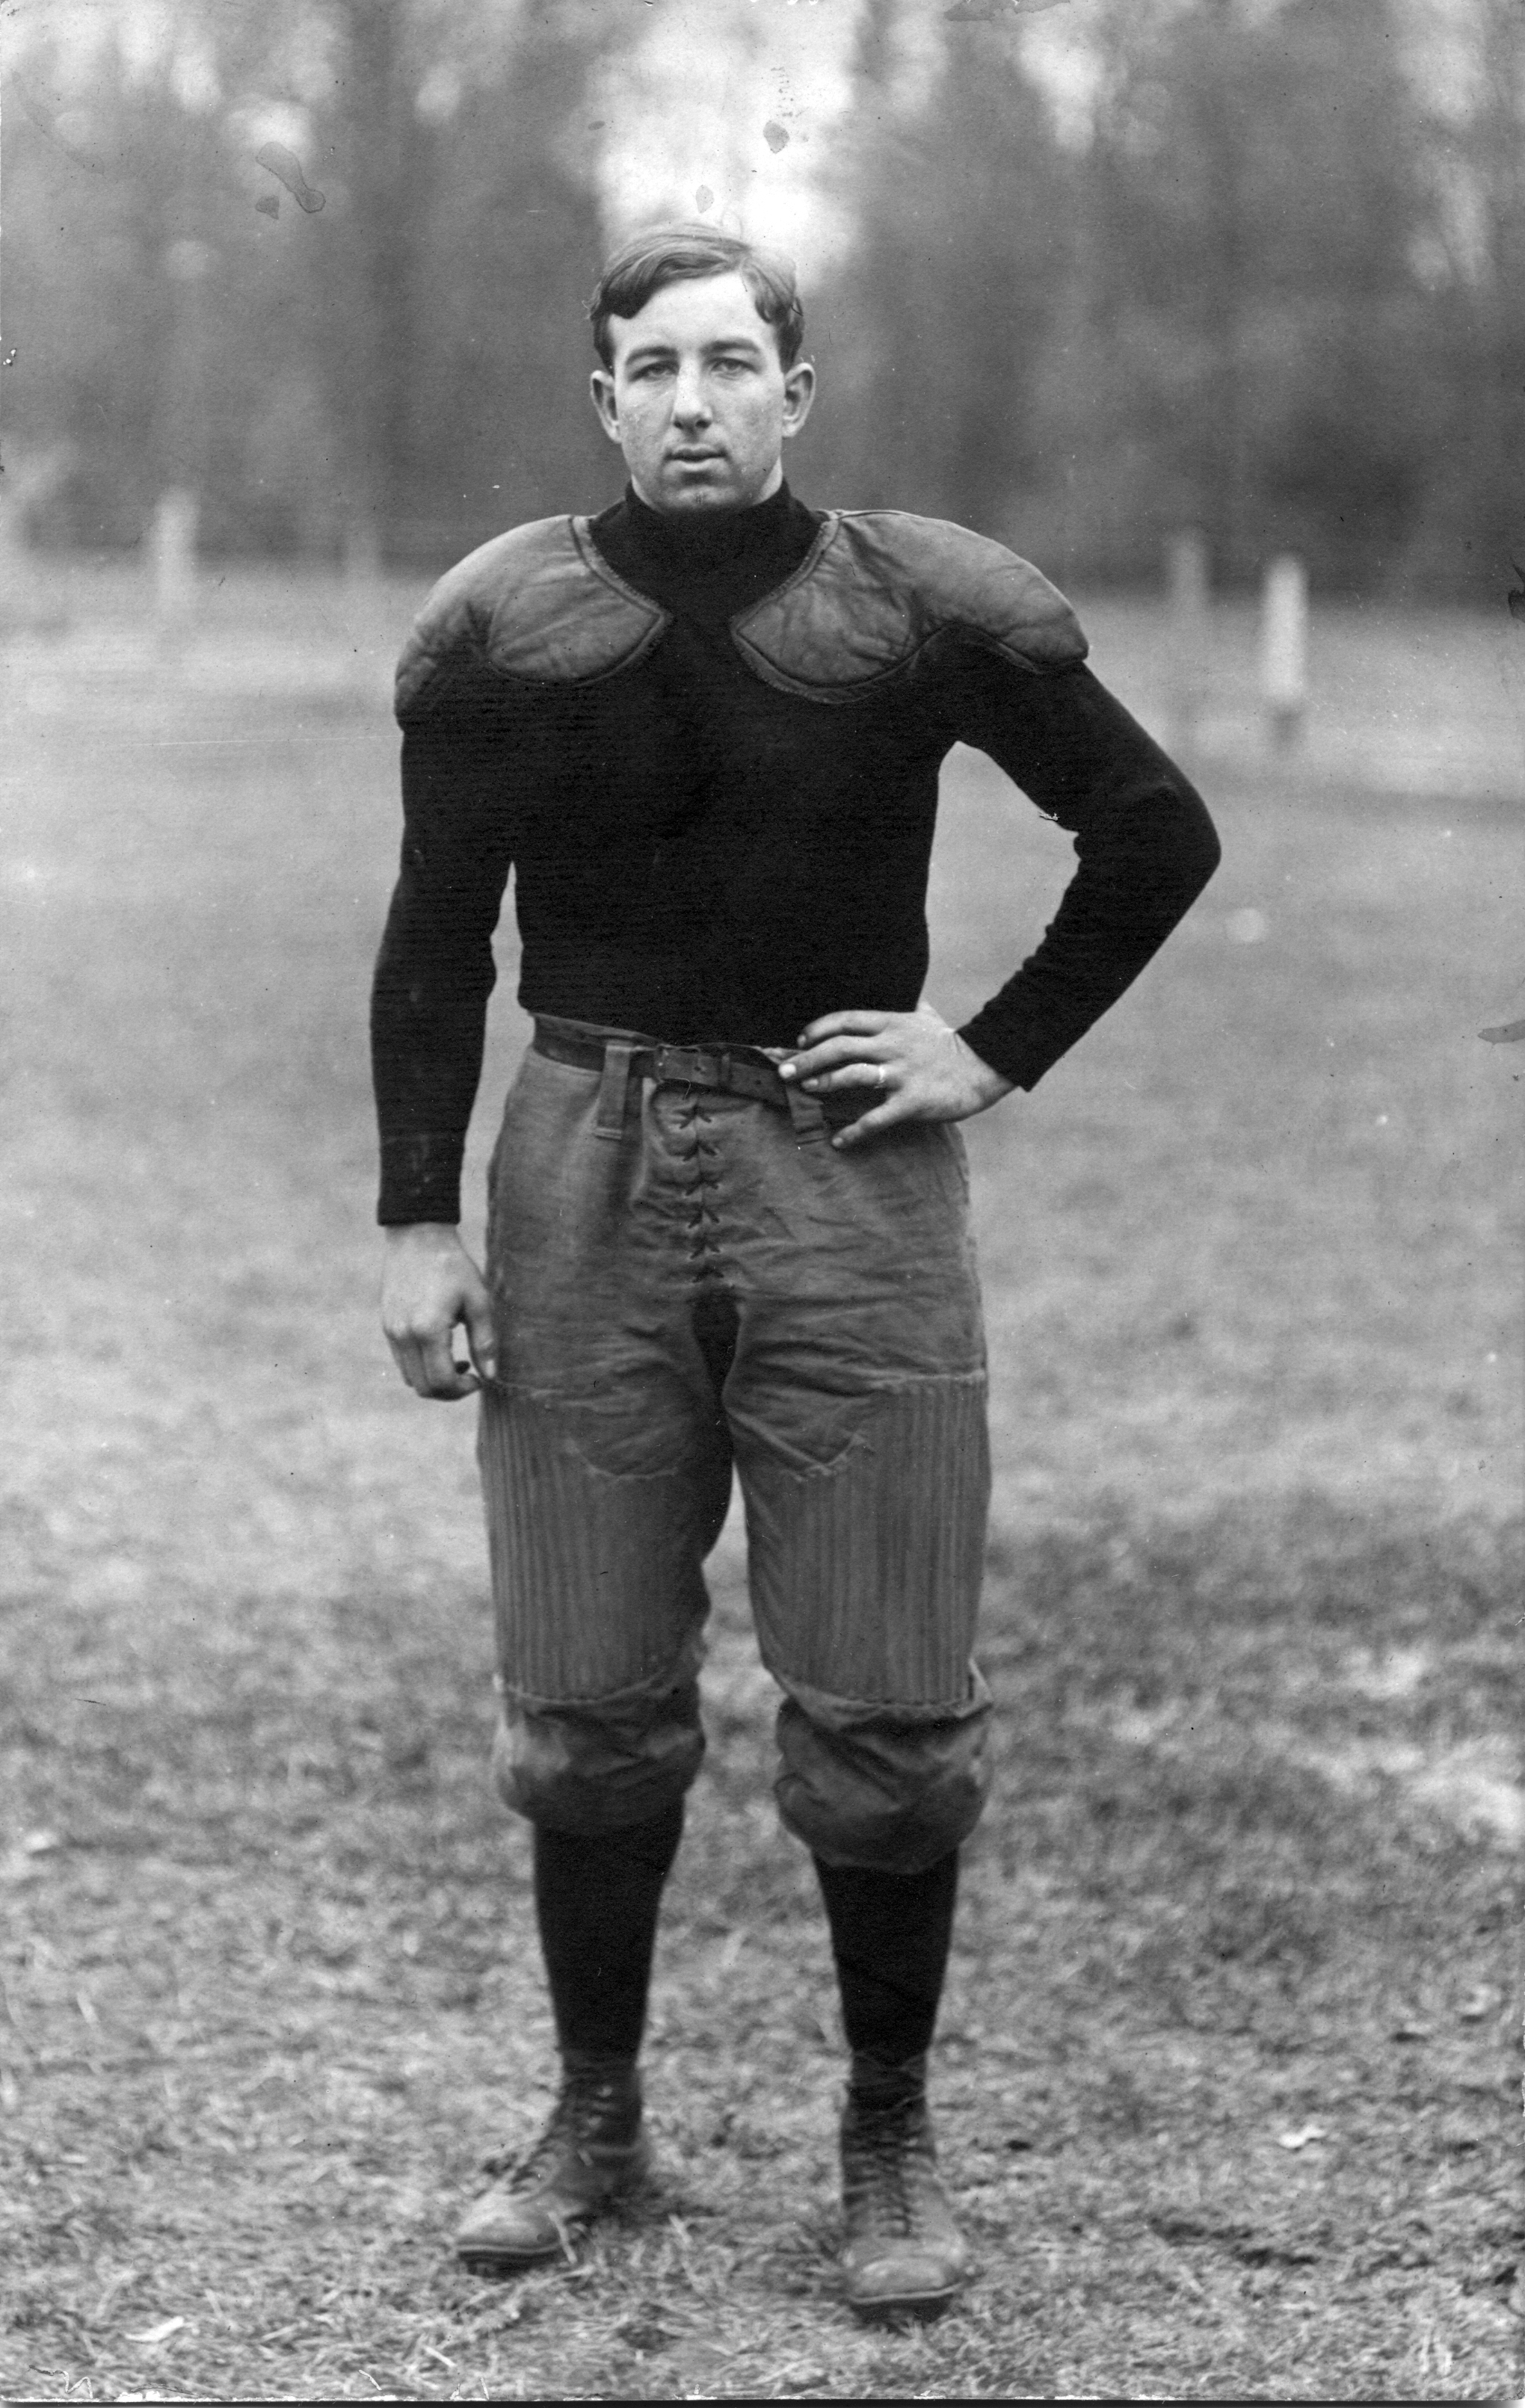 Exelby, M.A.C. football player, circa 1900-1909